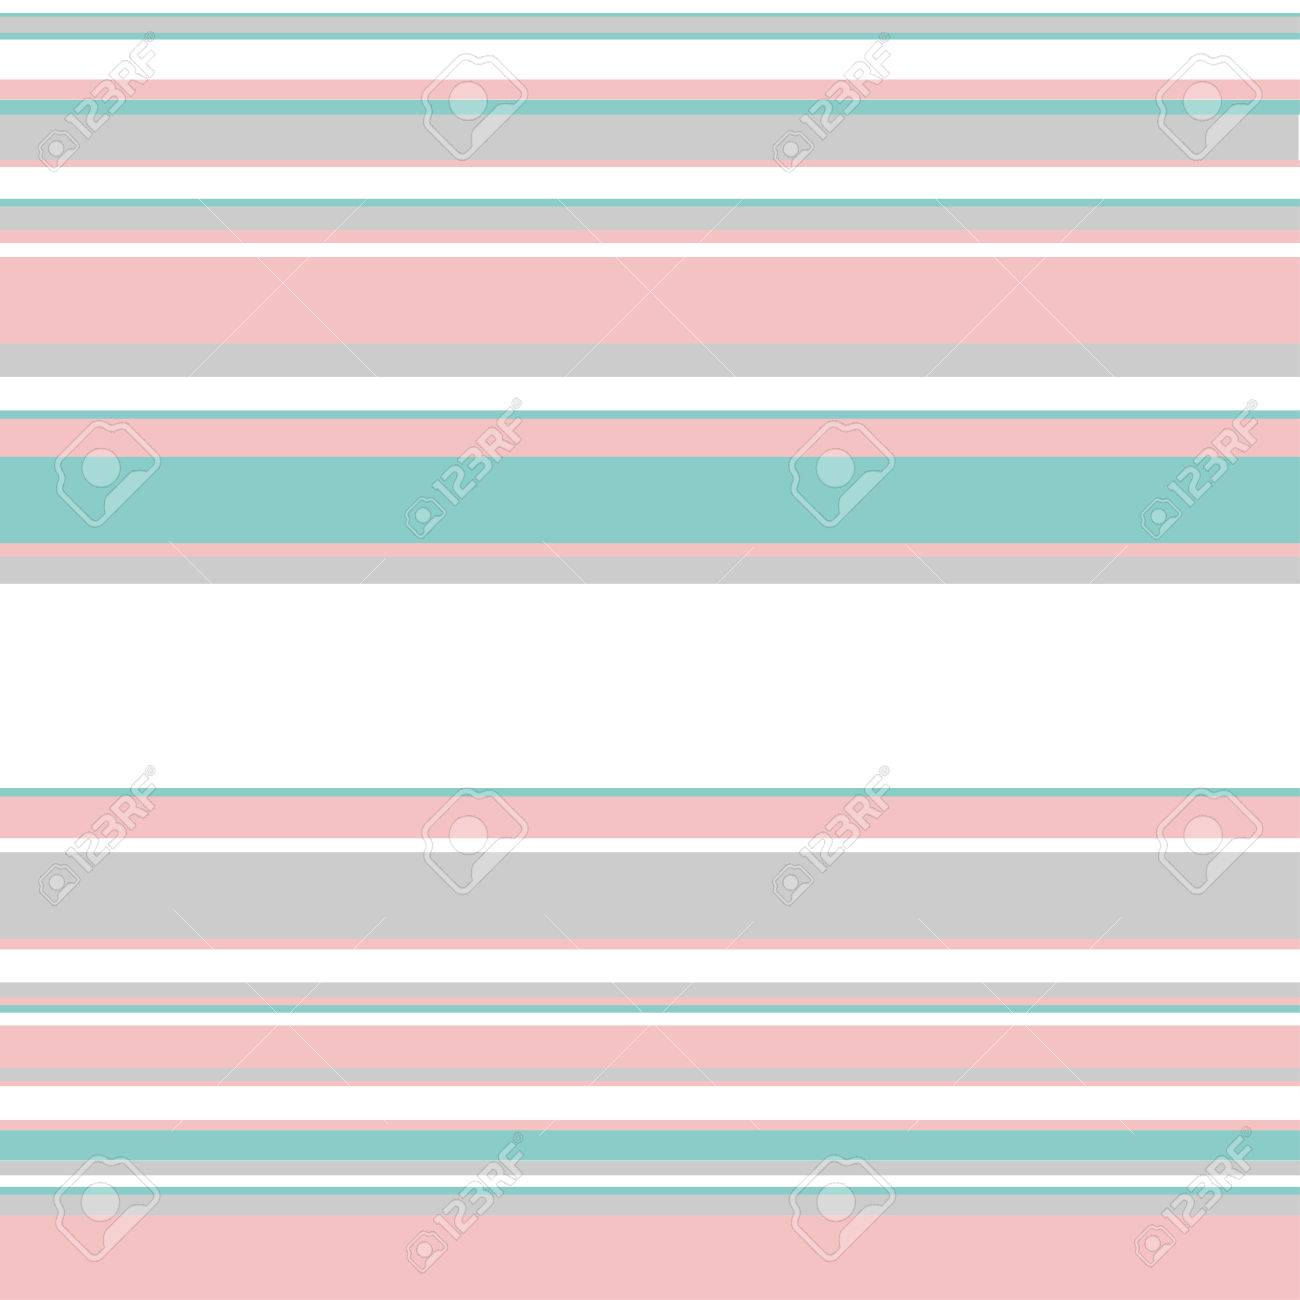 Seamless Horizontal Stripes Pattern Basic Shapes Backgrounds 1300x1300